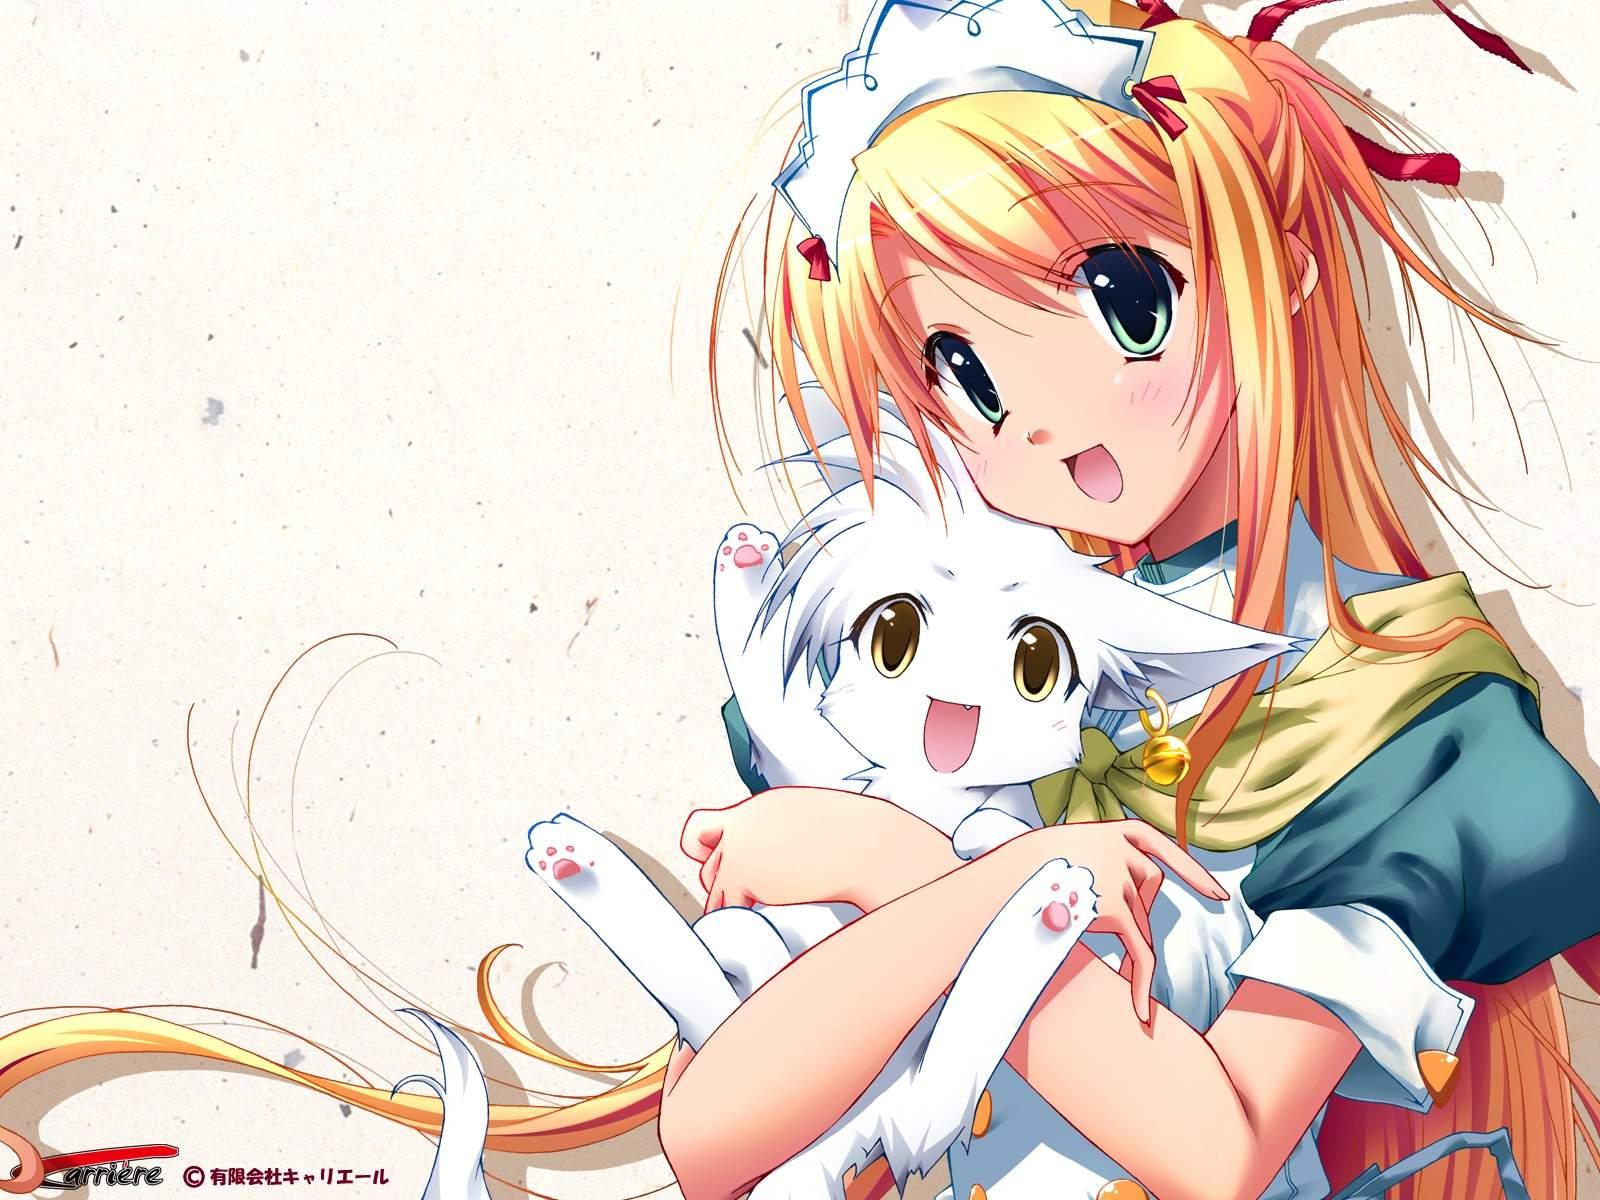 http://4.bp.blogspot.com/-Xdp5NdrP09o/TWzlTVX0f6I/AAAAAAAAHro/TnPMza4EIXE/s1600/anime_wallpaper%20(1).jpg